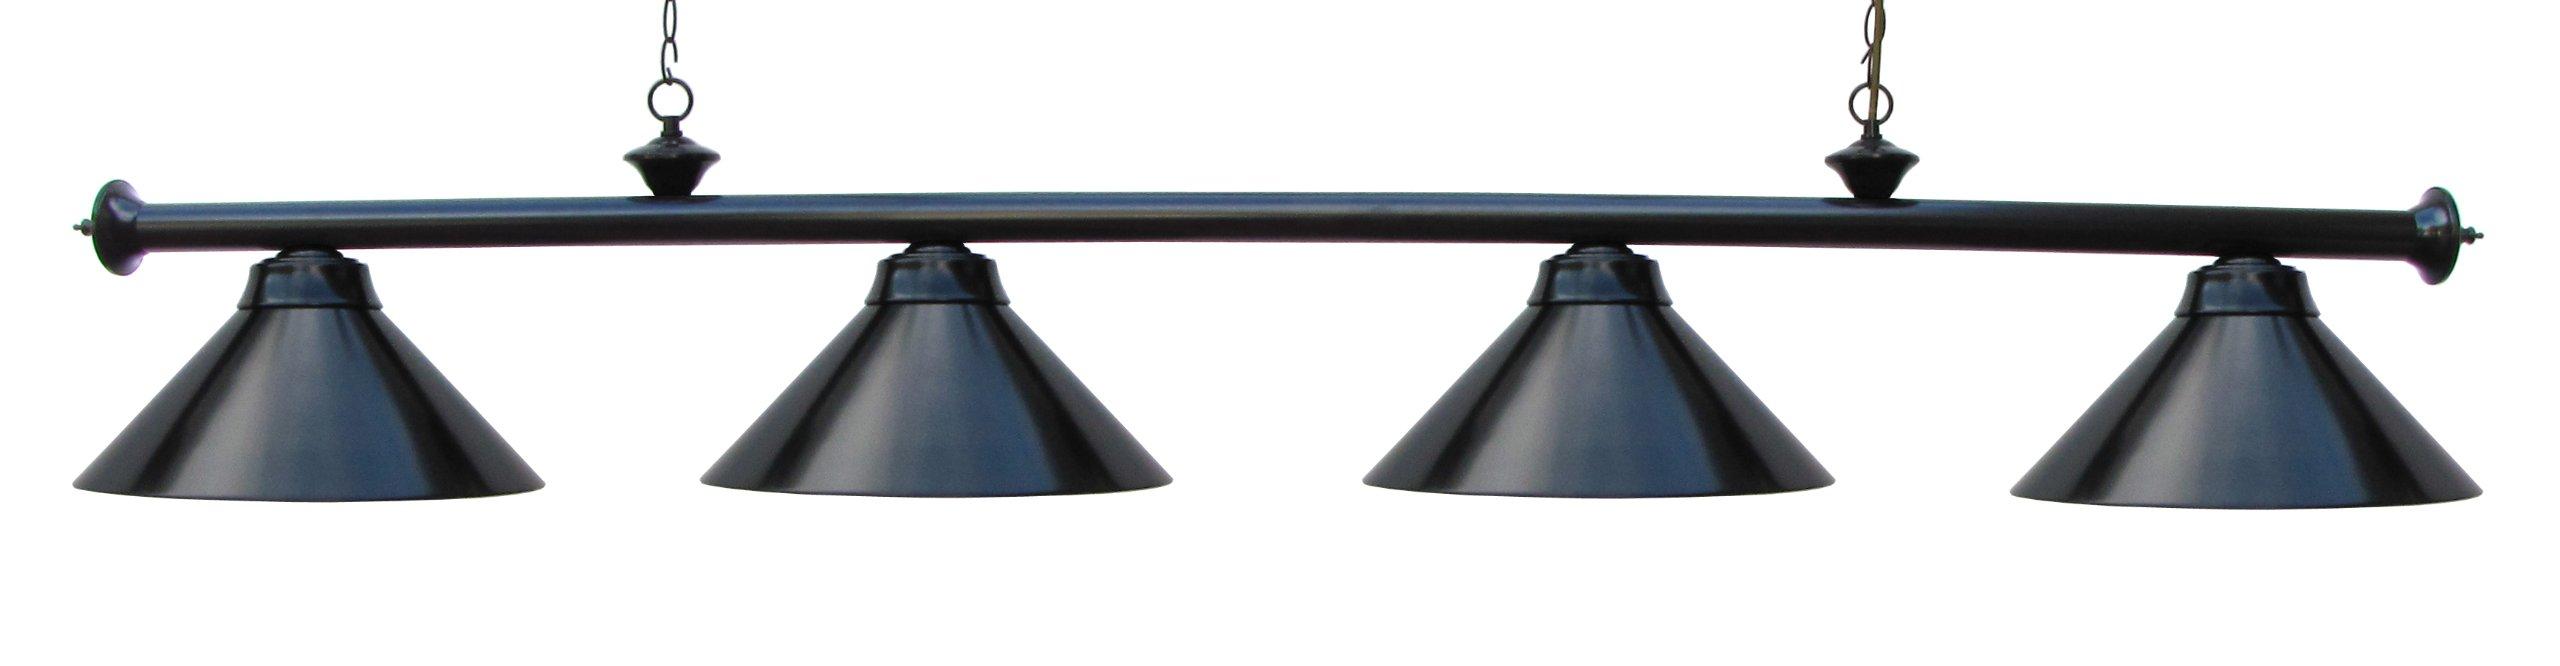 72 pool table light billiard lamp choose black or burgundy metal shades product image